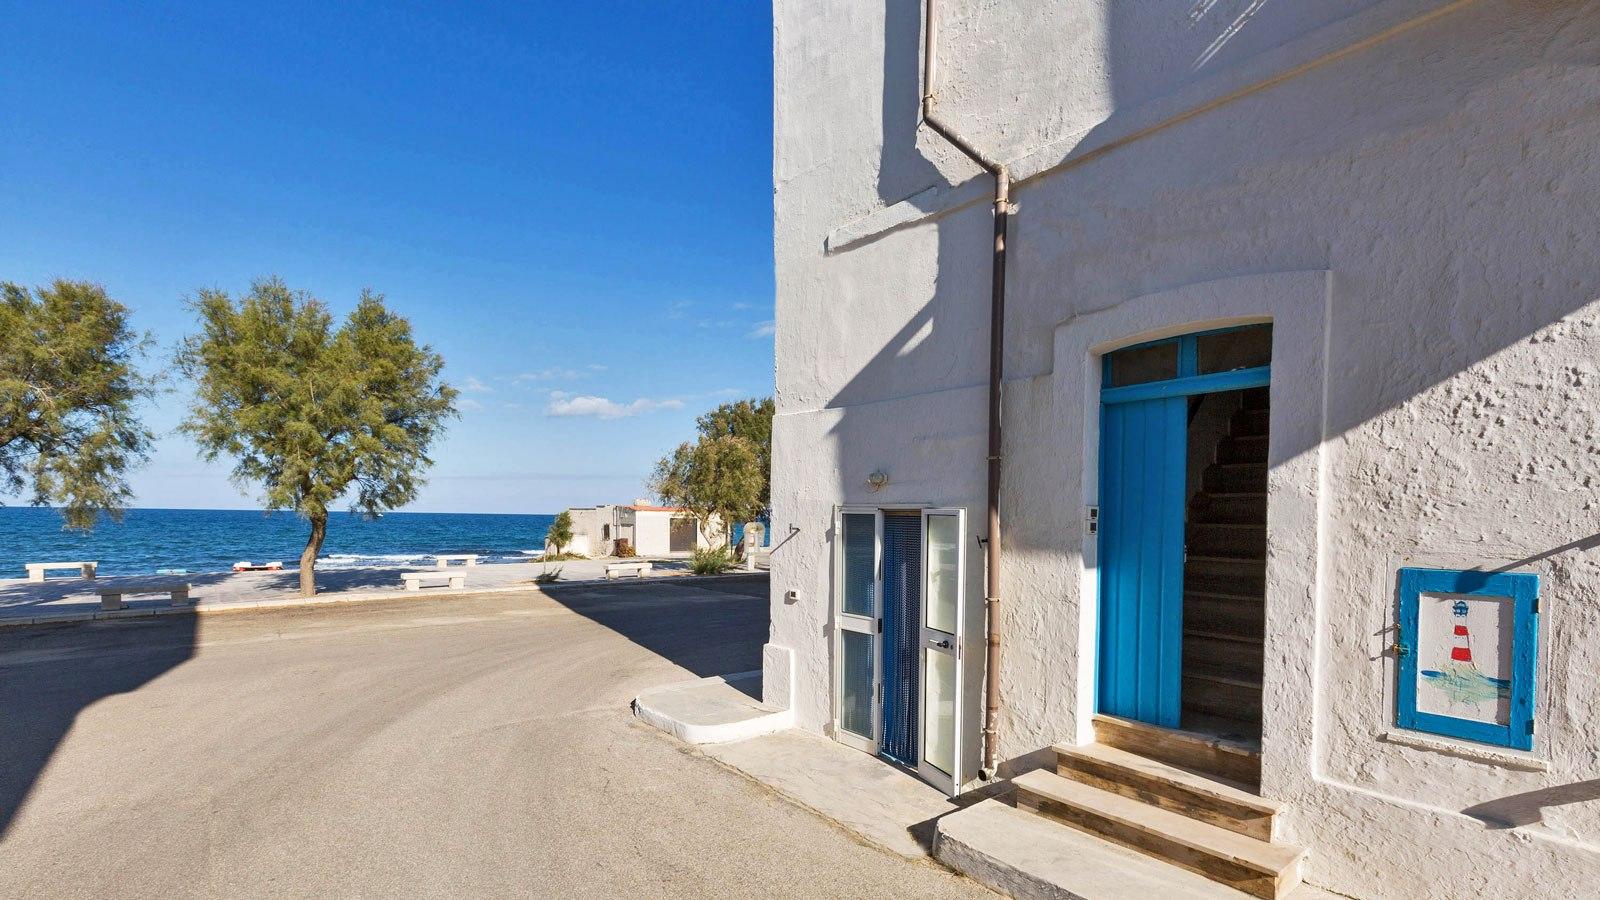 vacanze ostuni casa lorenzo ingresso mare